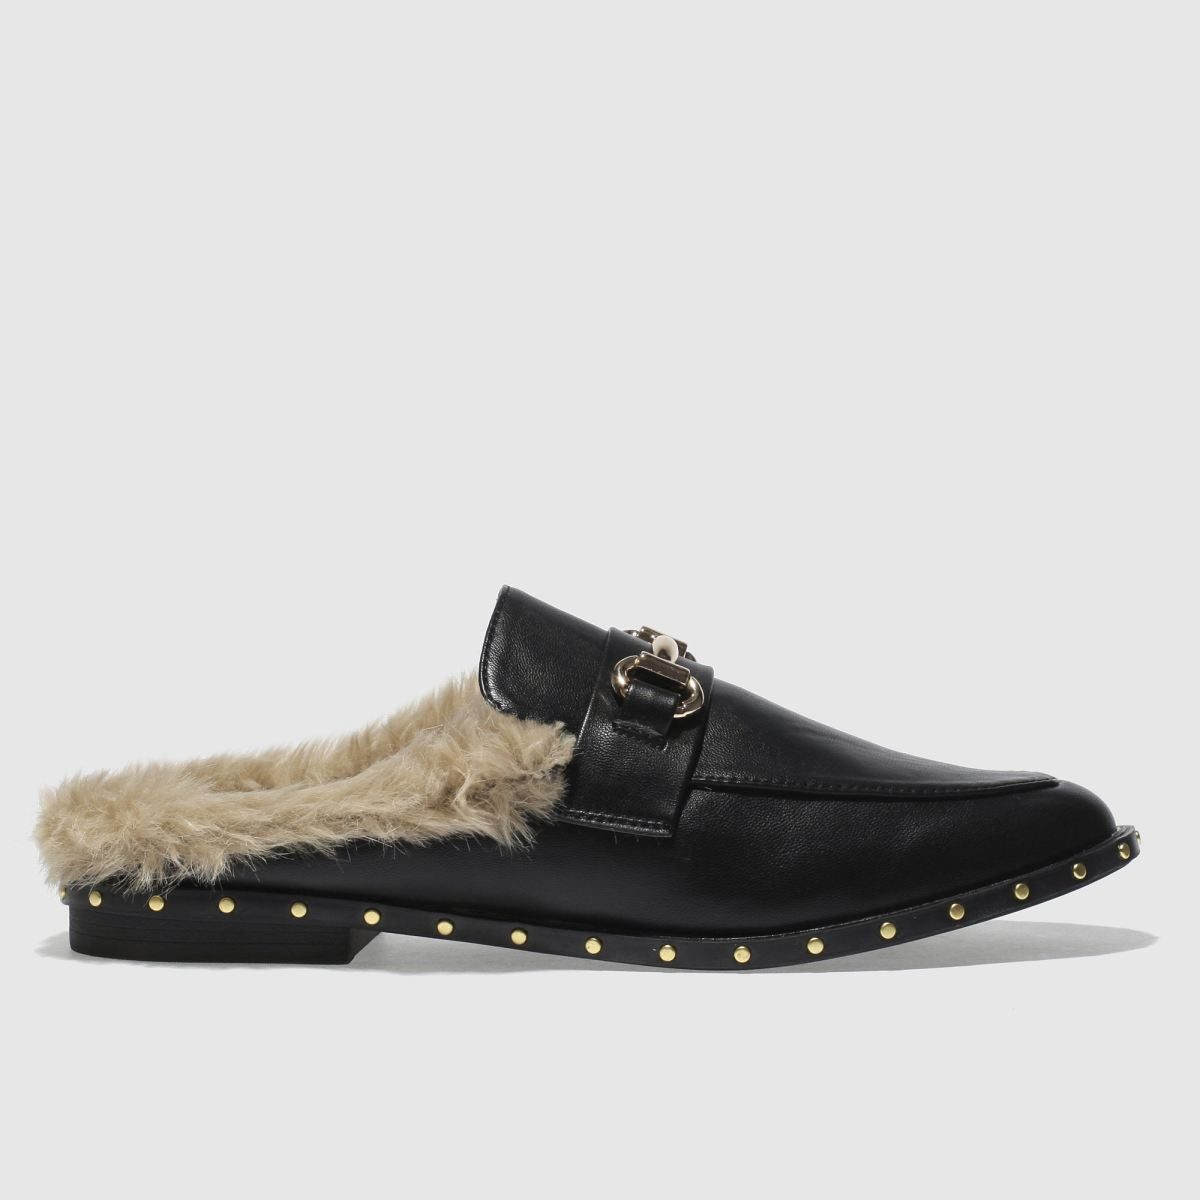 Schuh Black Swanky Flat Shoes